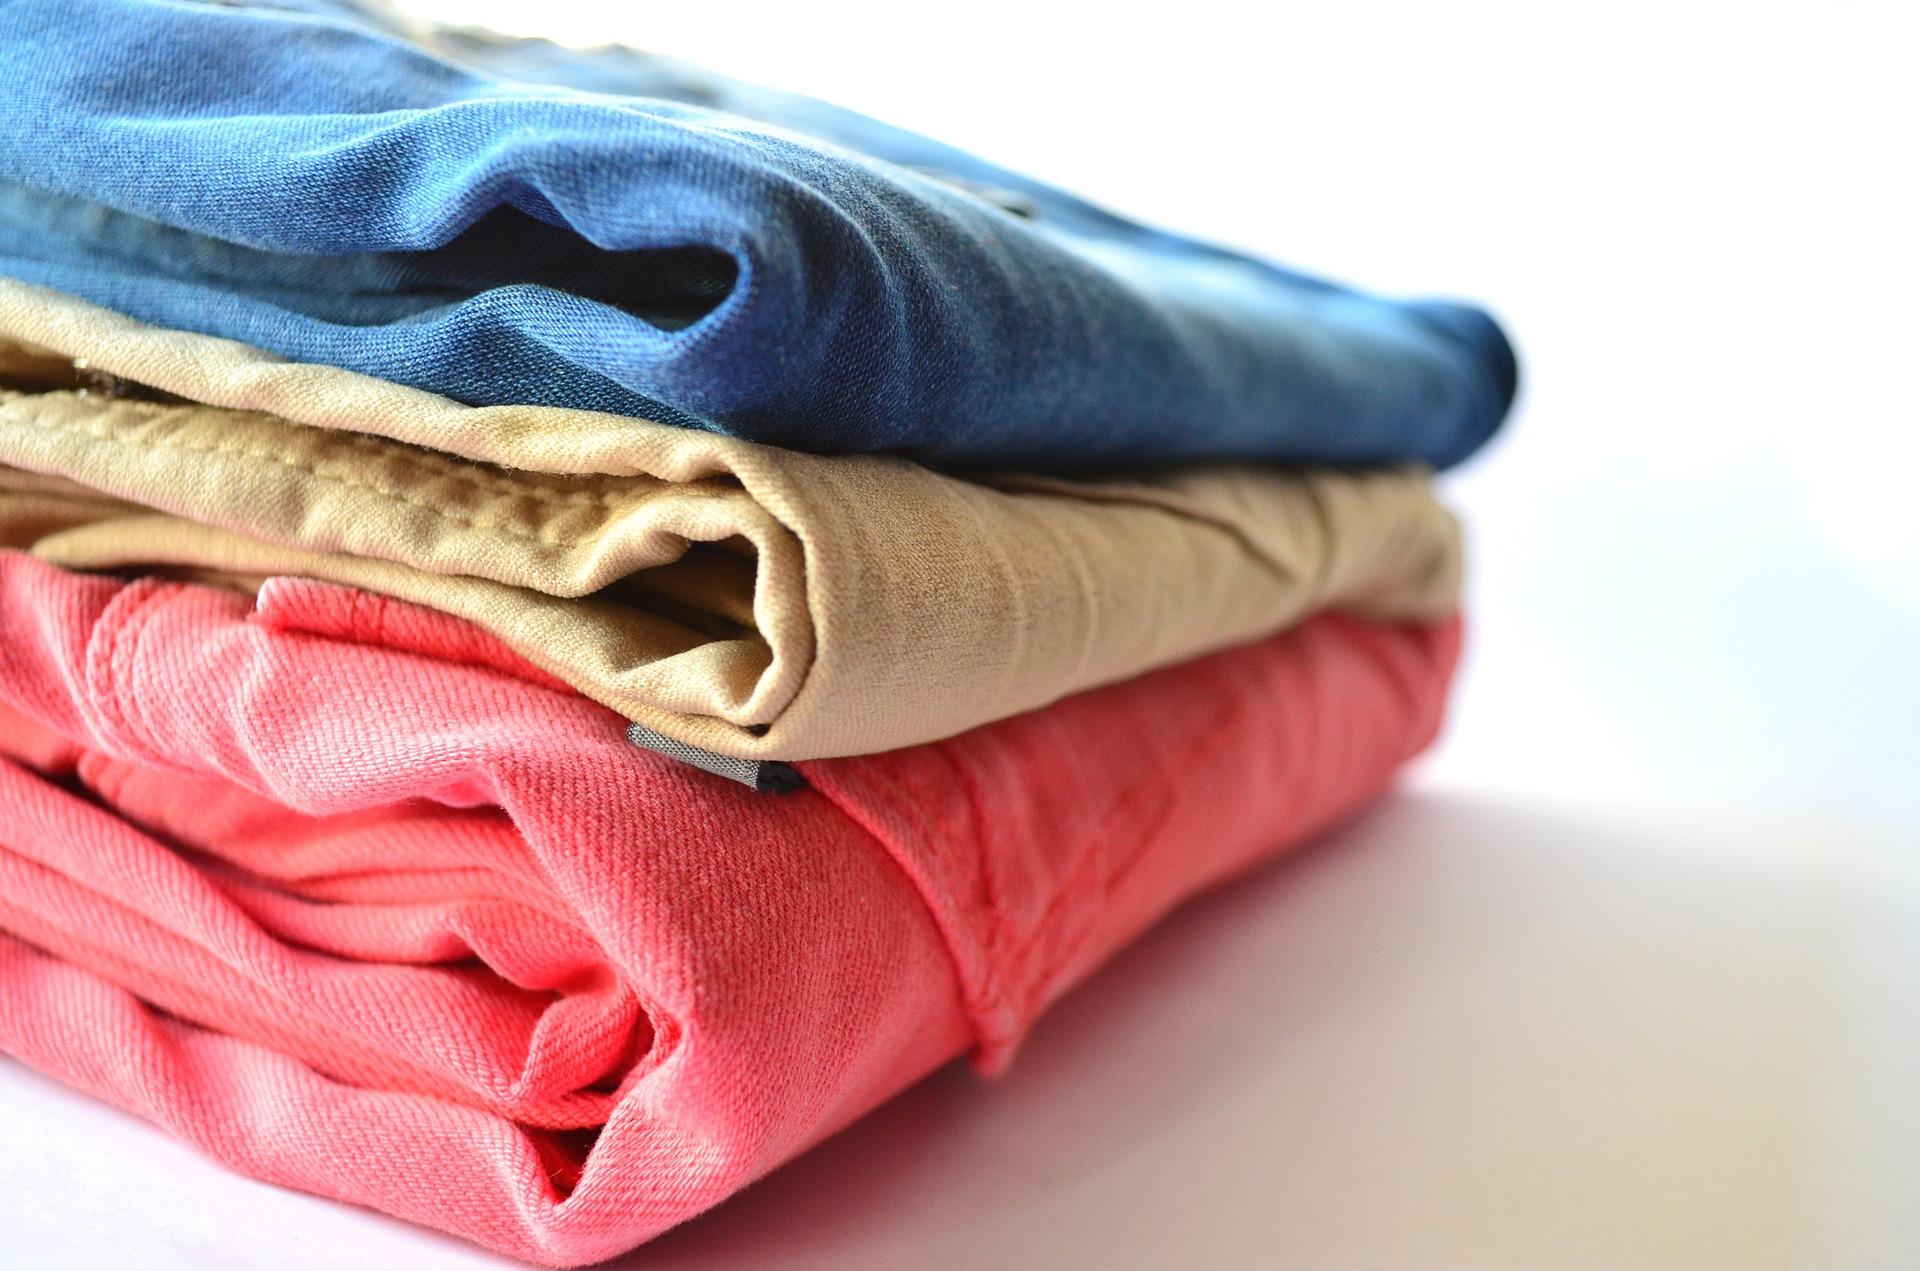 clothes-166848_1920.jpg